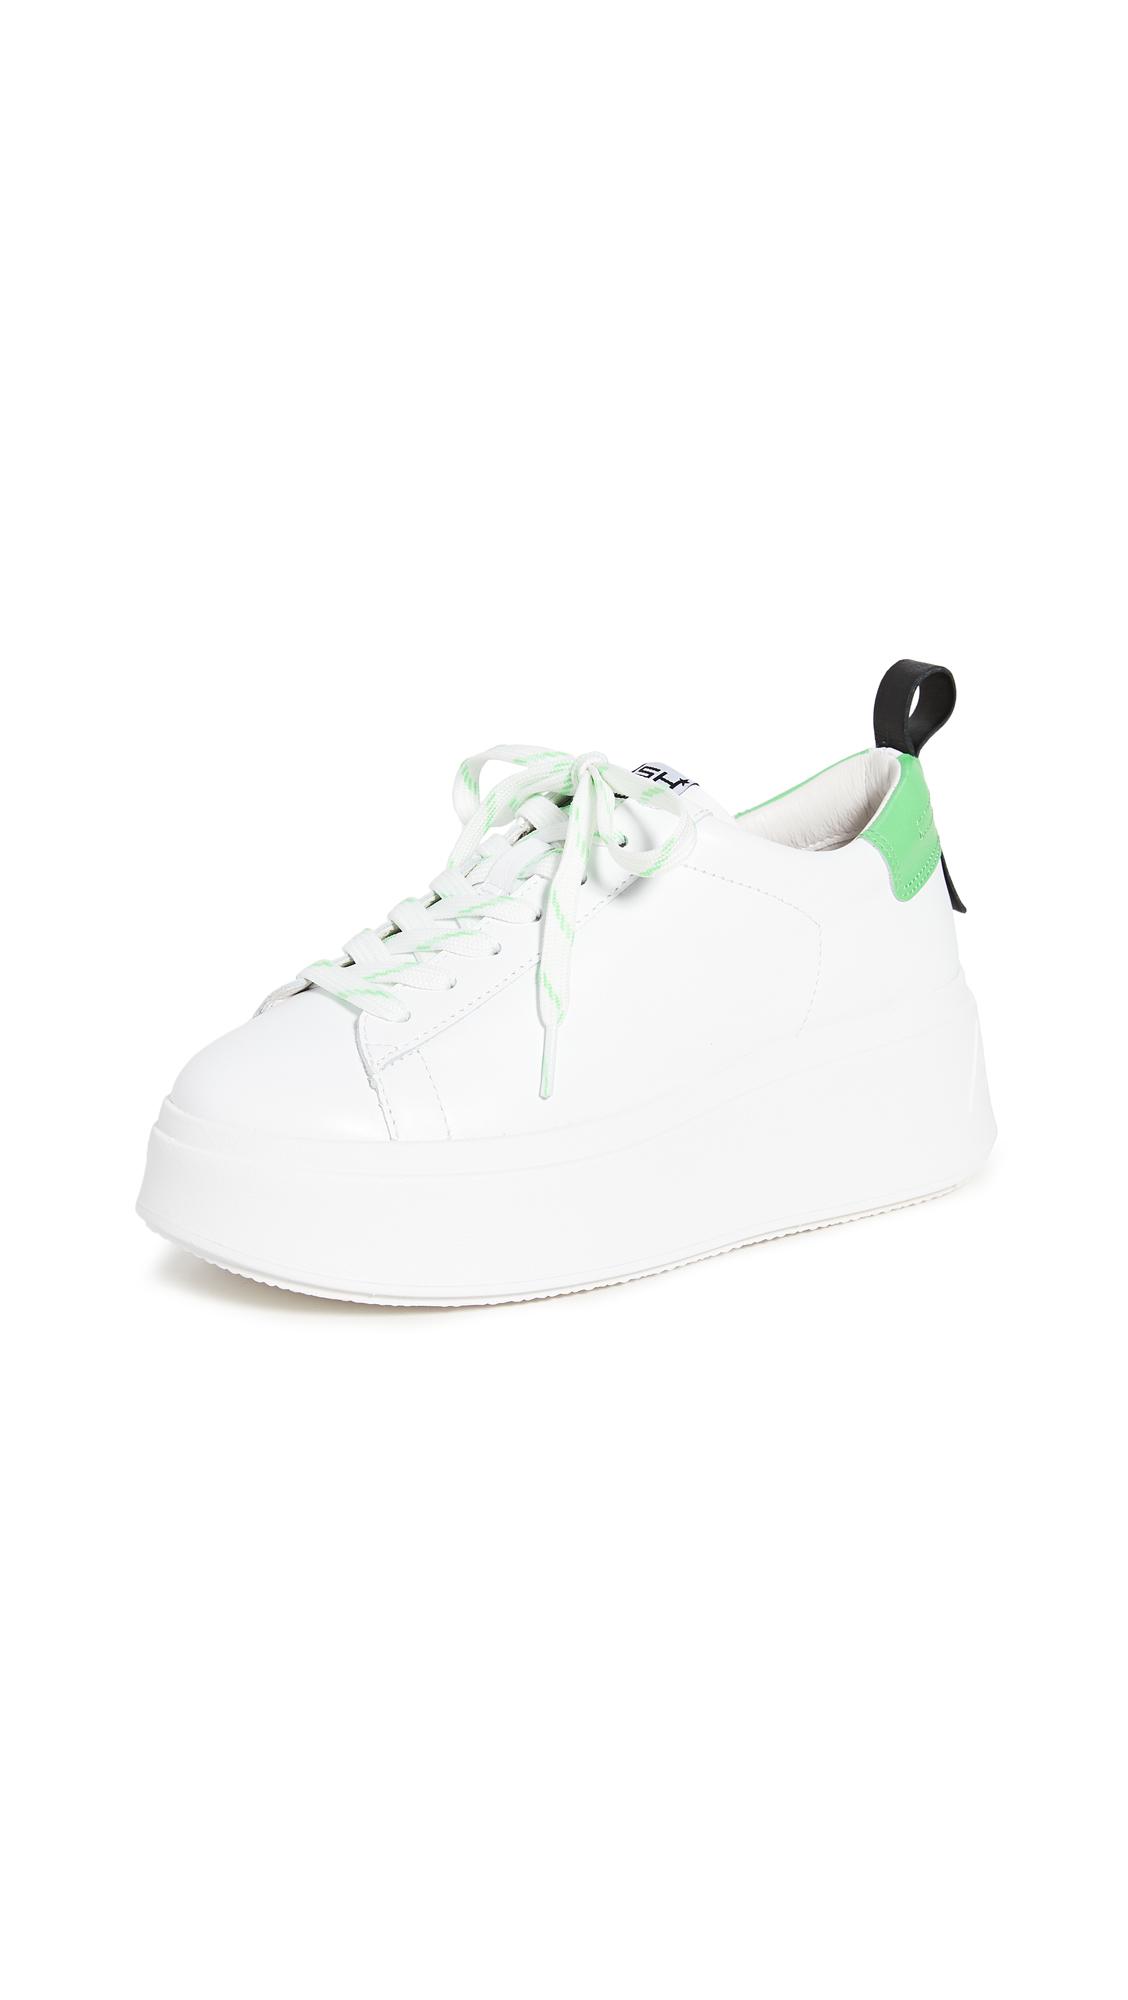 Buy Ash Moon Platform Sneakers online, shop Ash